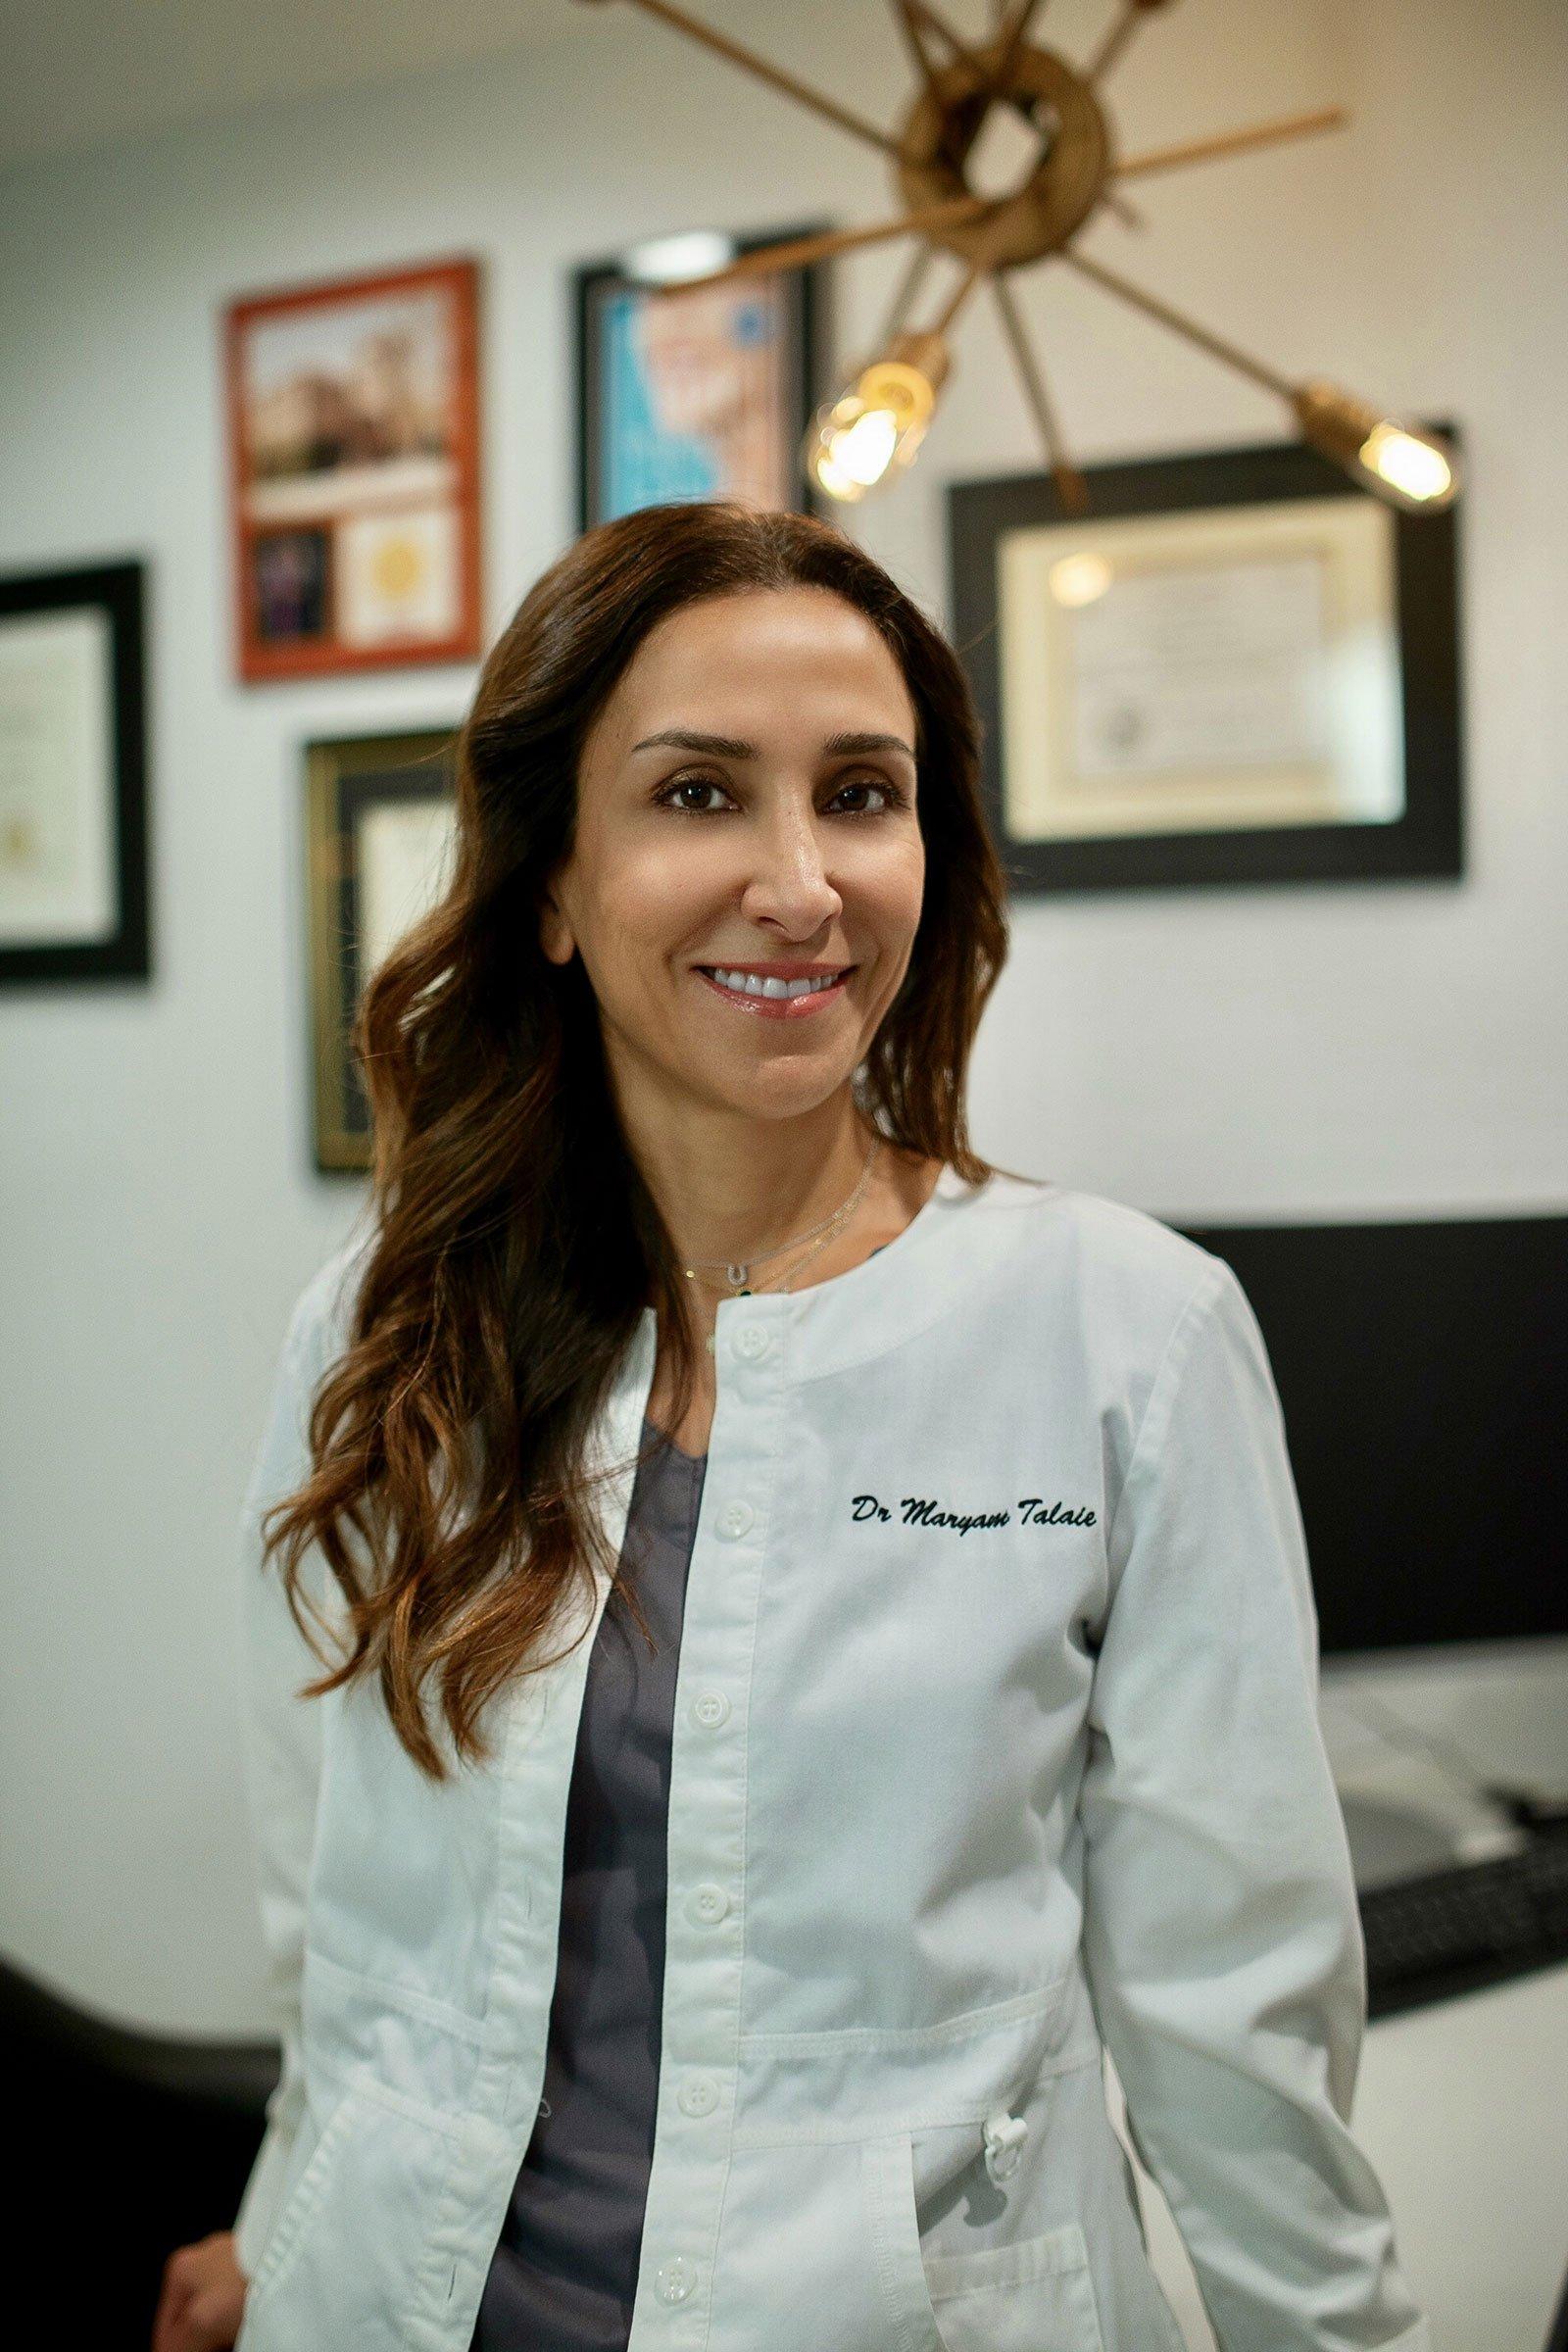 Dr. Maryam Talaie | Century Smile Dental Practice | Culver City, CA